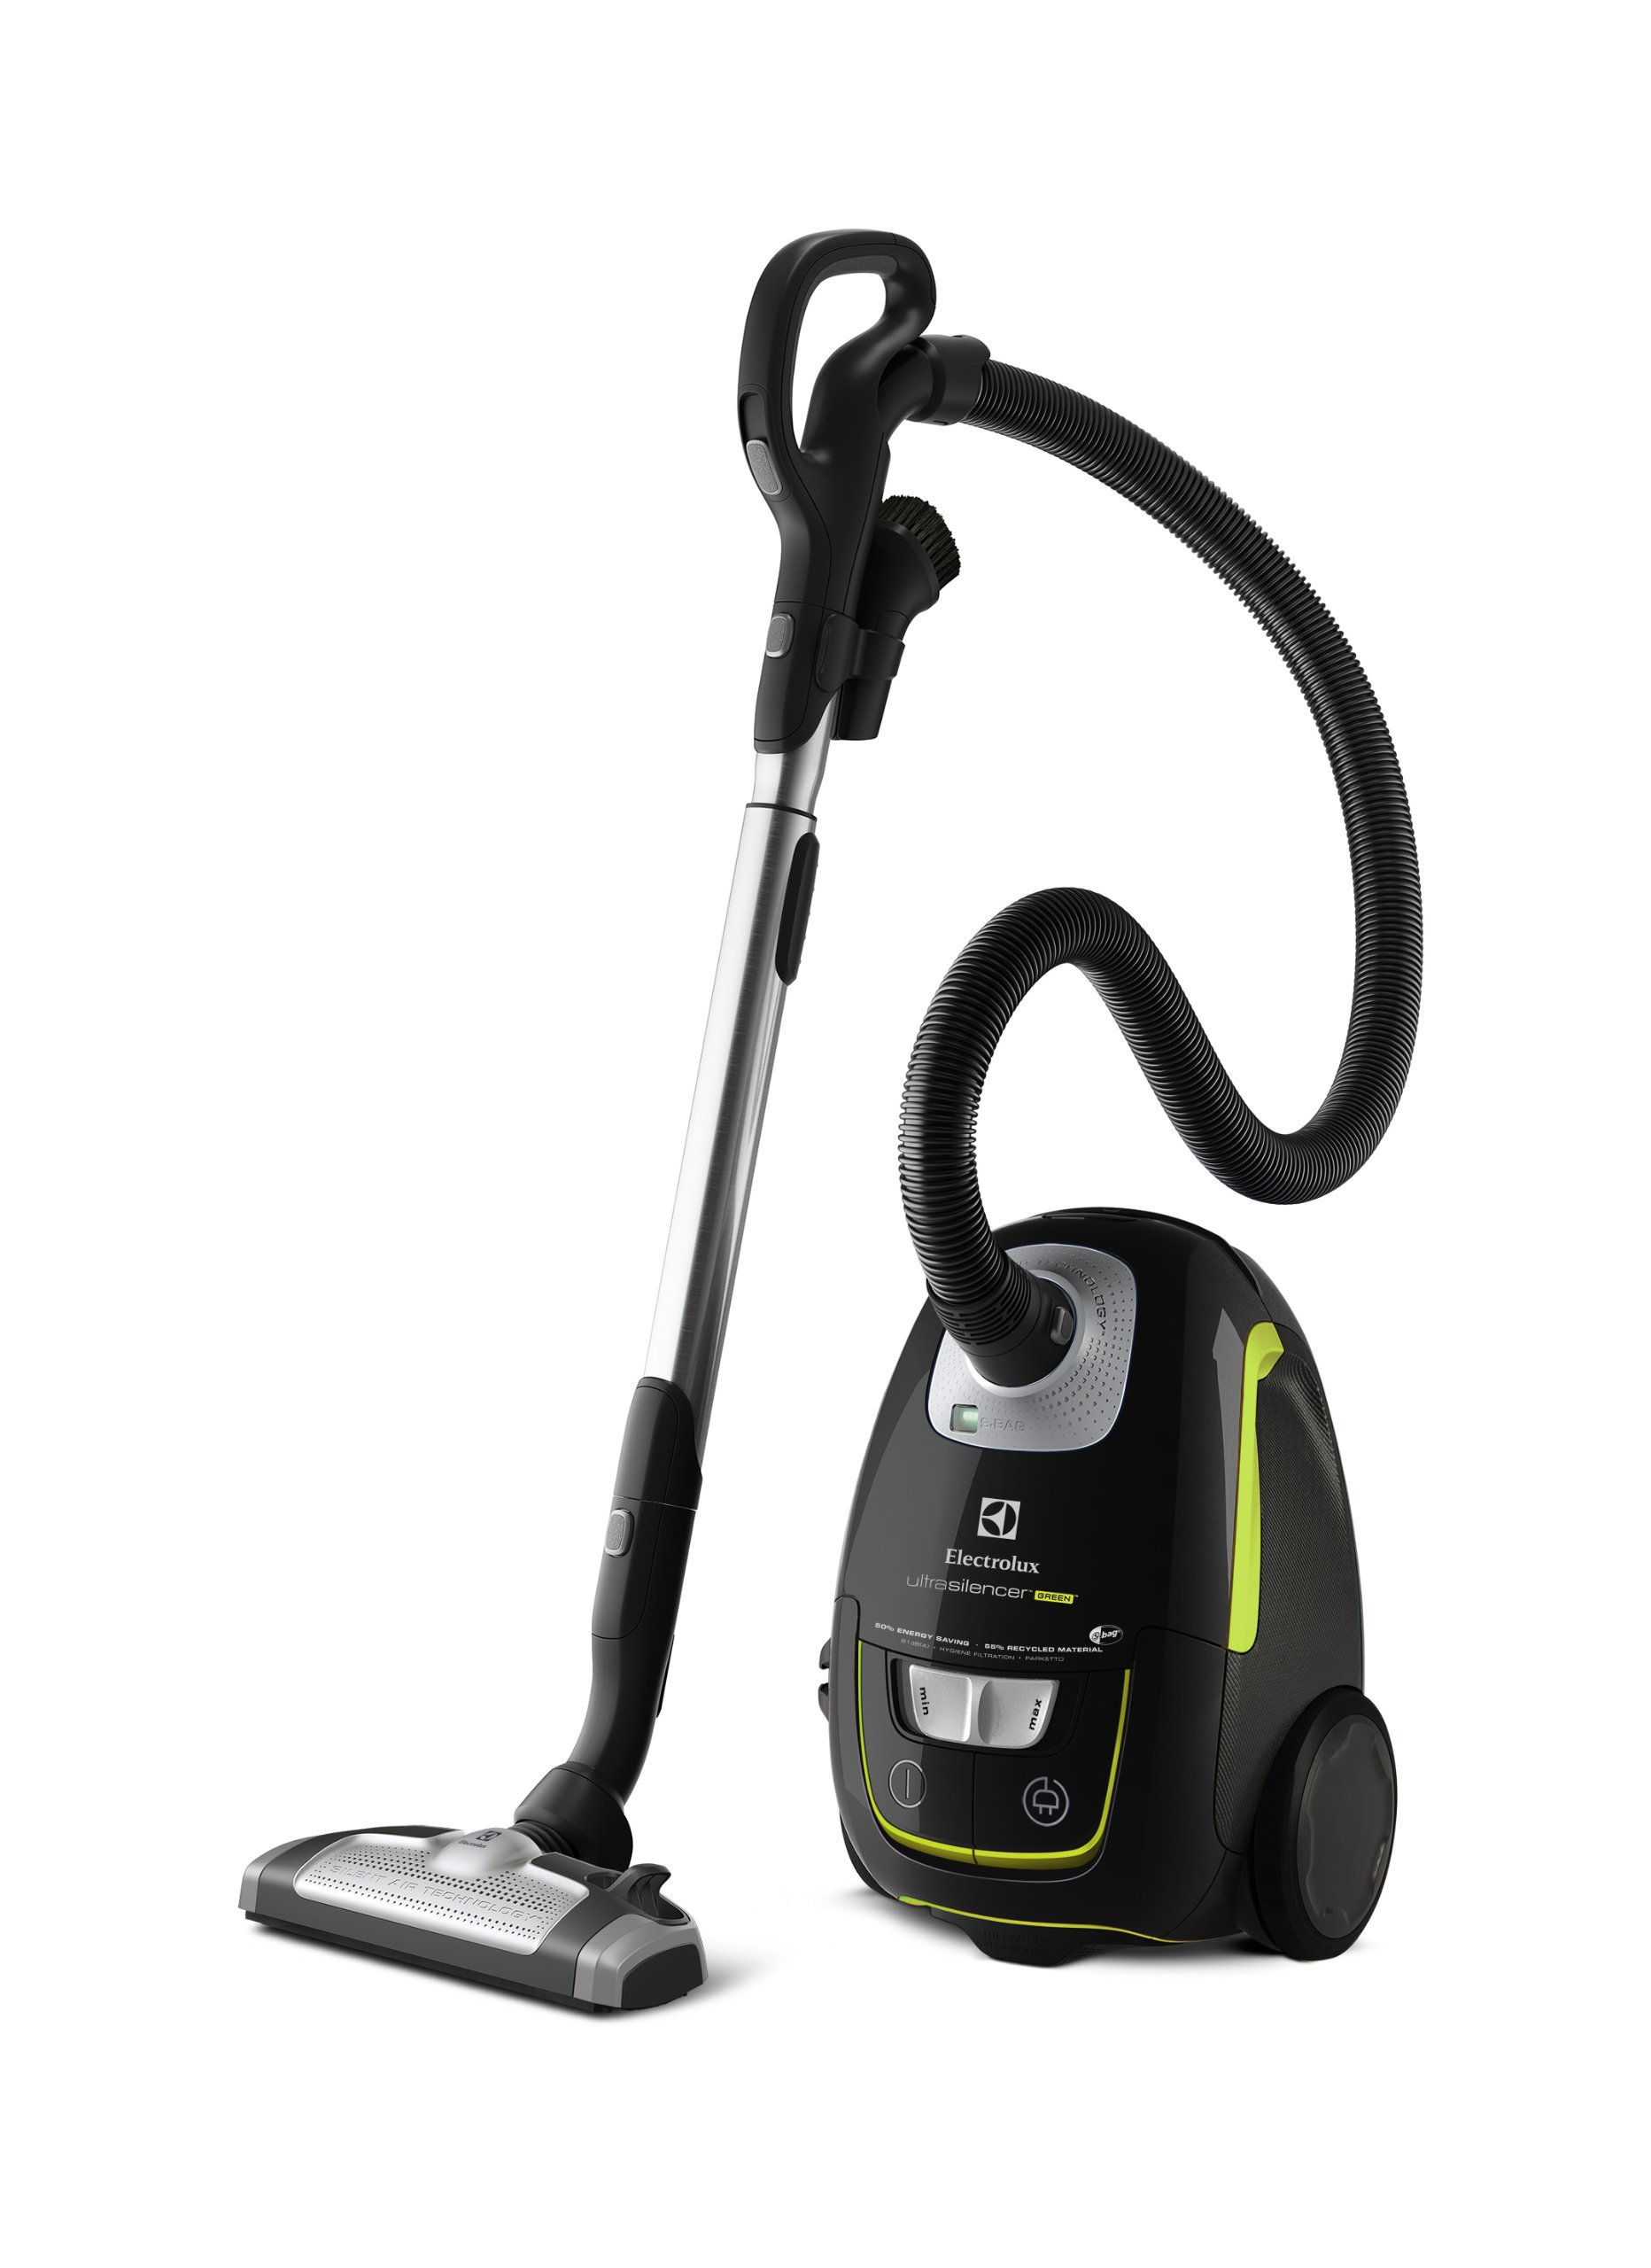 Electrolux UltraSilencer Green – Aspirador silencioso con bolsa y cepillo AeroPro Parketto Pro, color negro ébano y verde: Amazon.es: Hogar